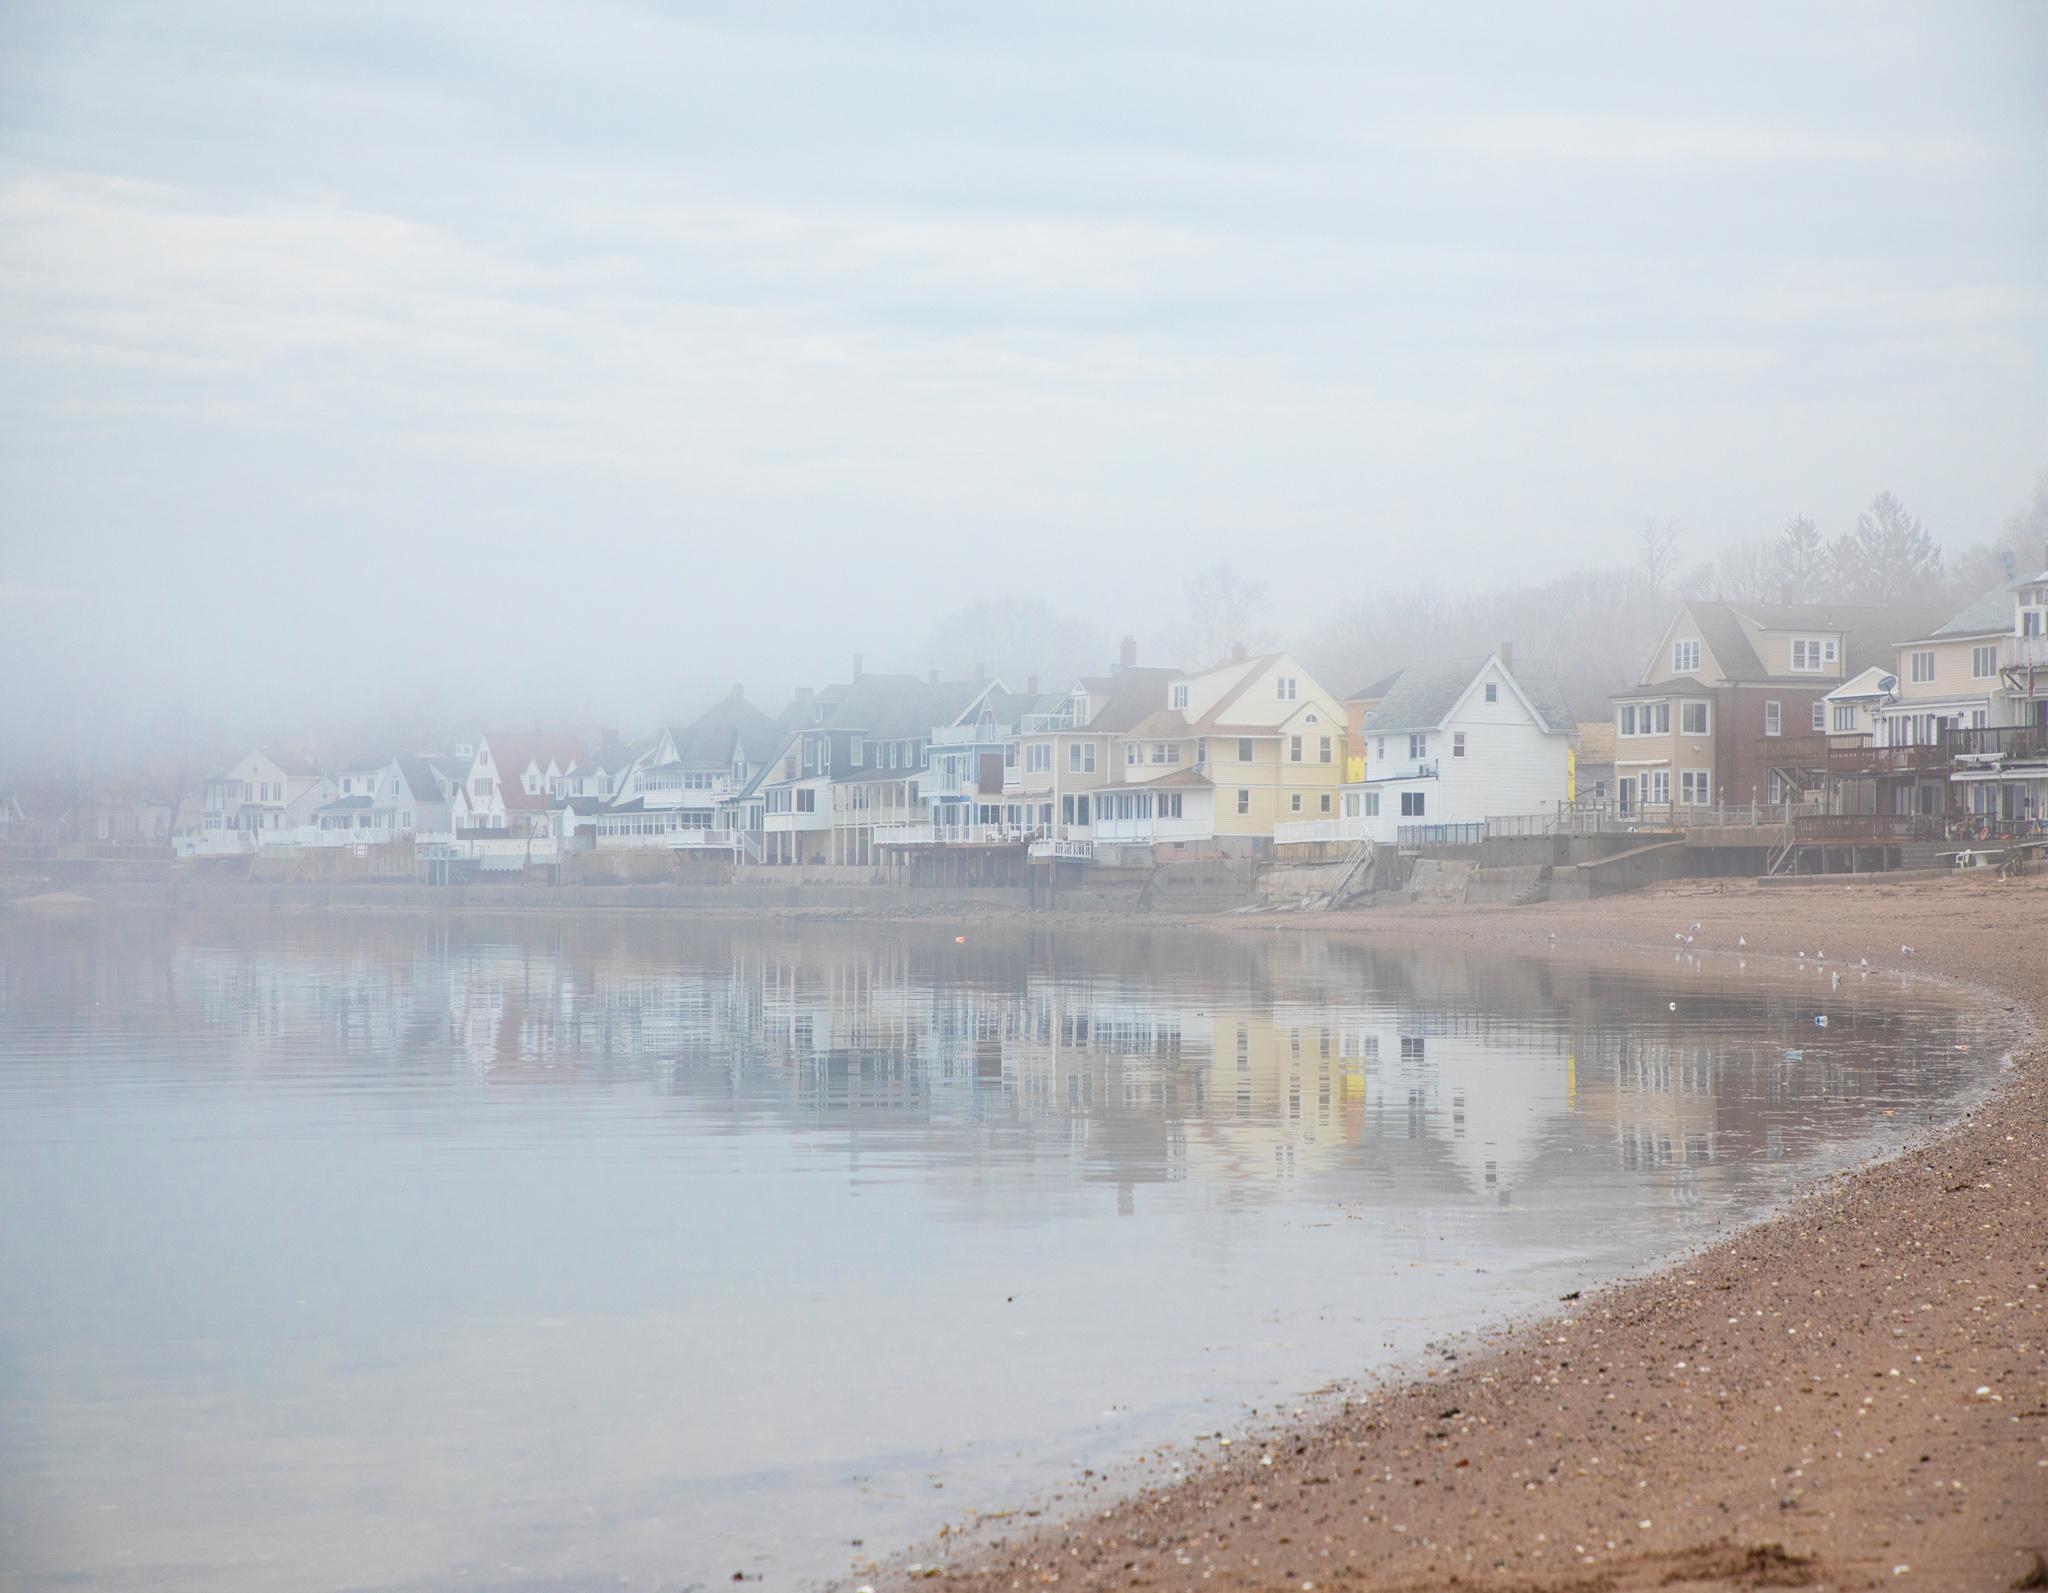 February: Morris Cove